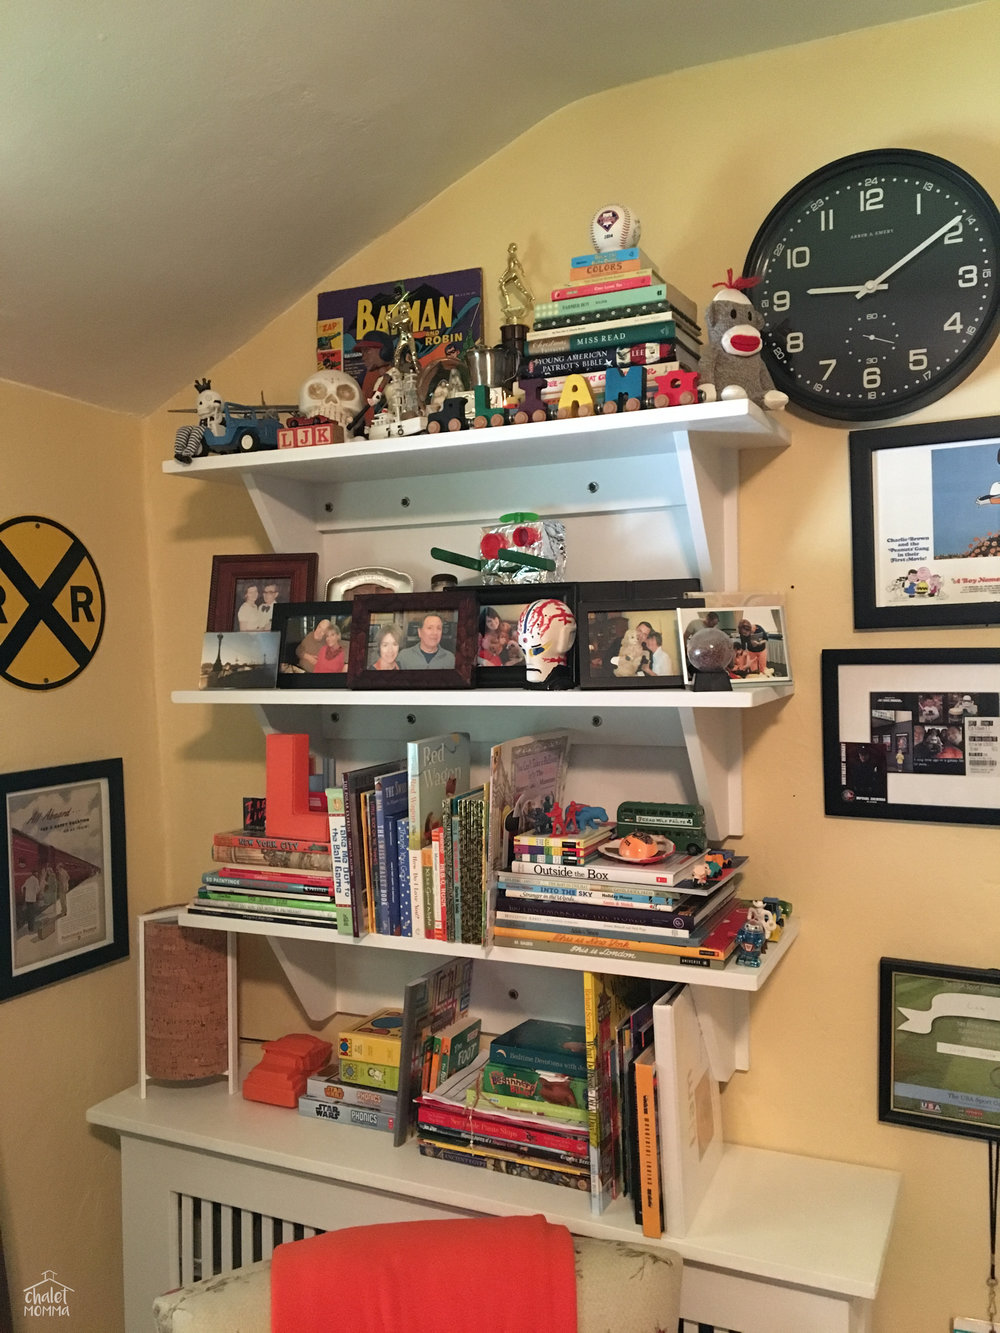 L's wall shelves wm.JPG